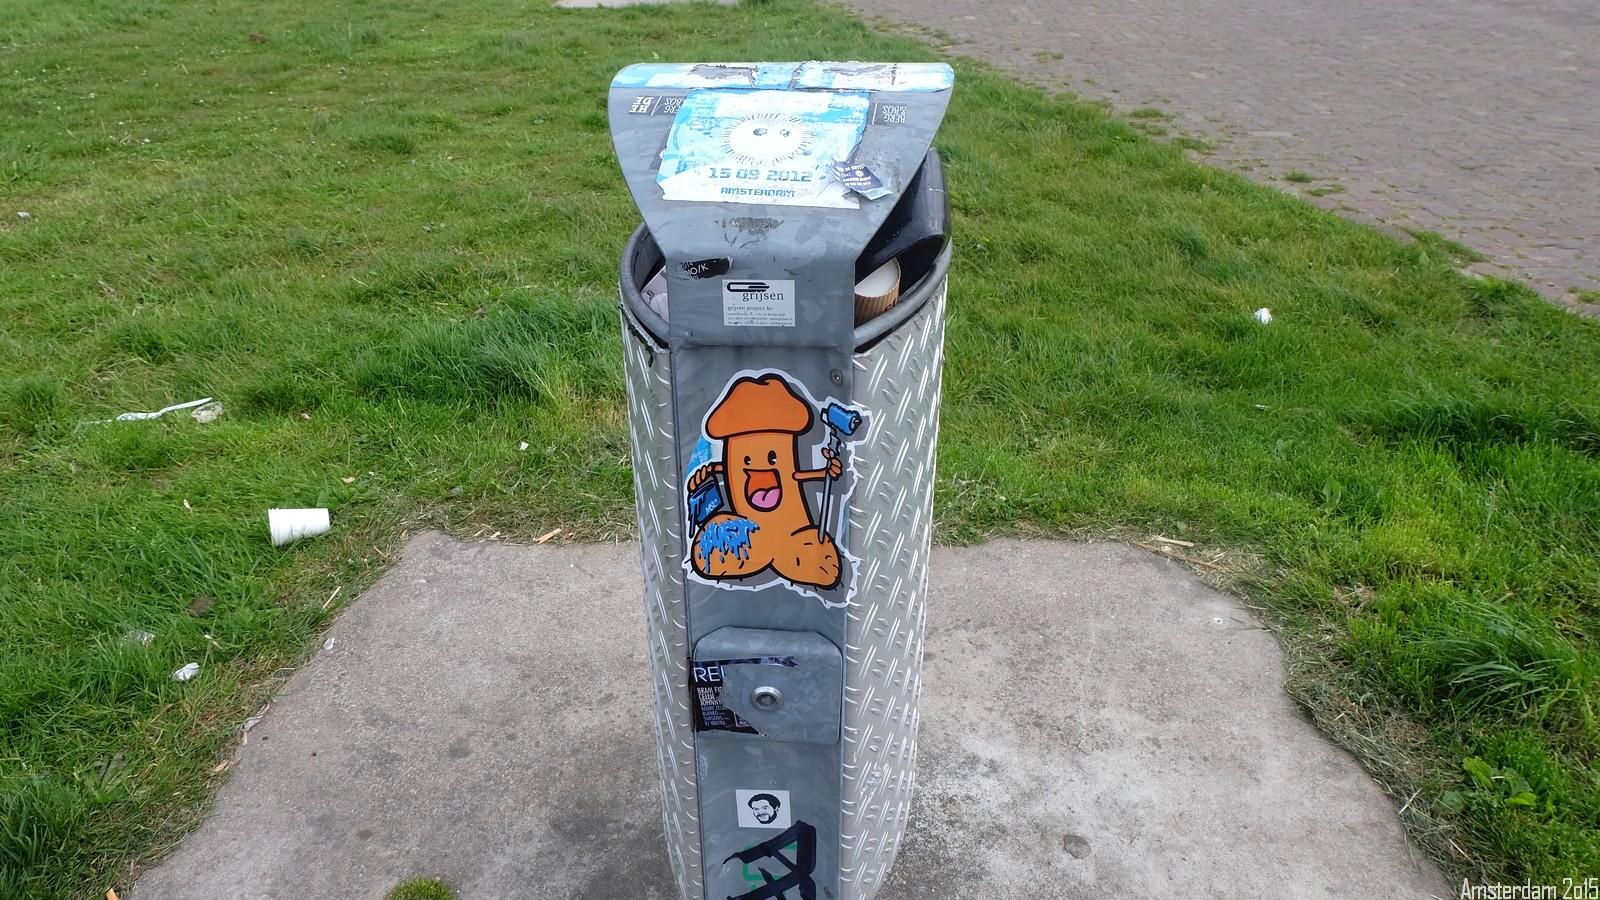 NDSM, Amsterdam, Nederland